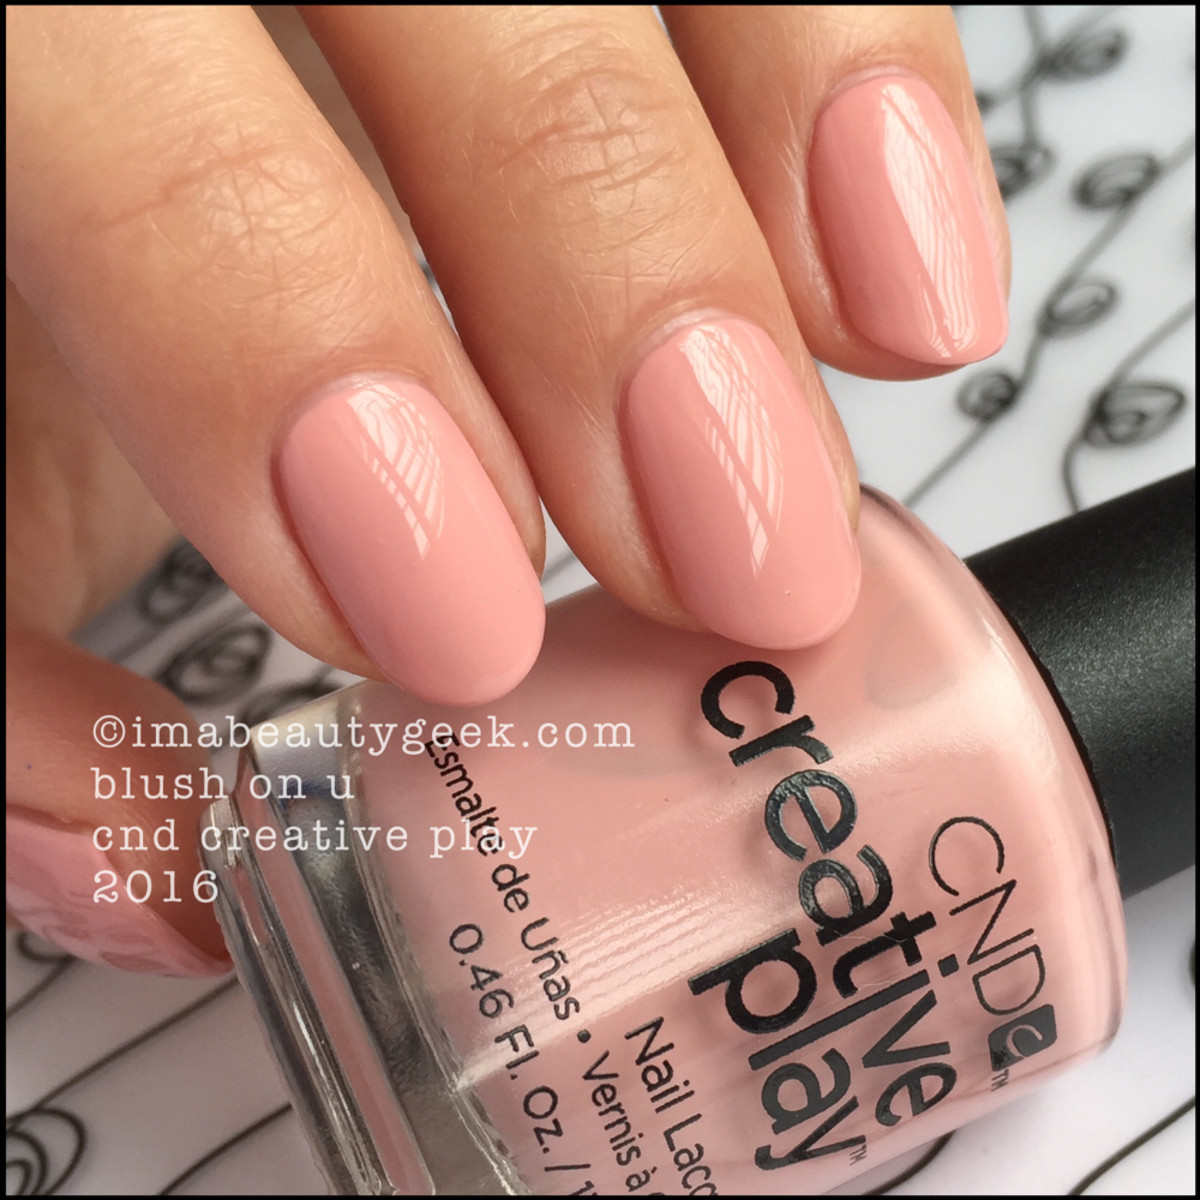 CND Creative Play Blush On U_CND Creative Play Nail Polish Swatches